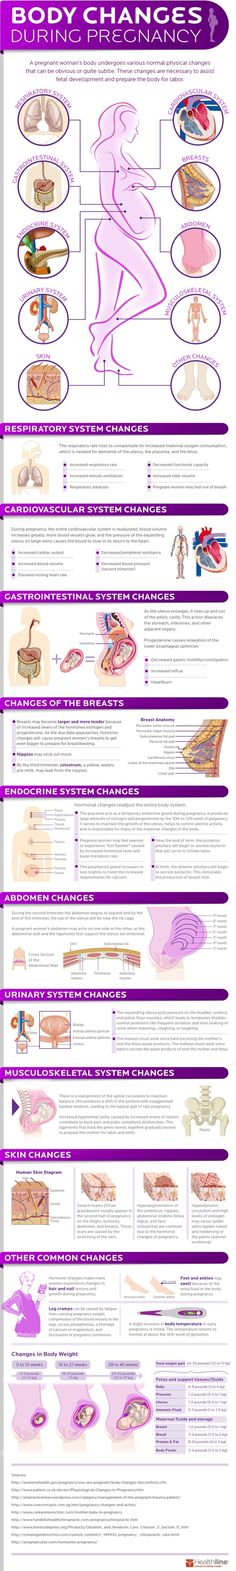 Pregnancy - Popular Health & Fitness Pins on Pinterest